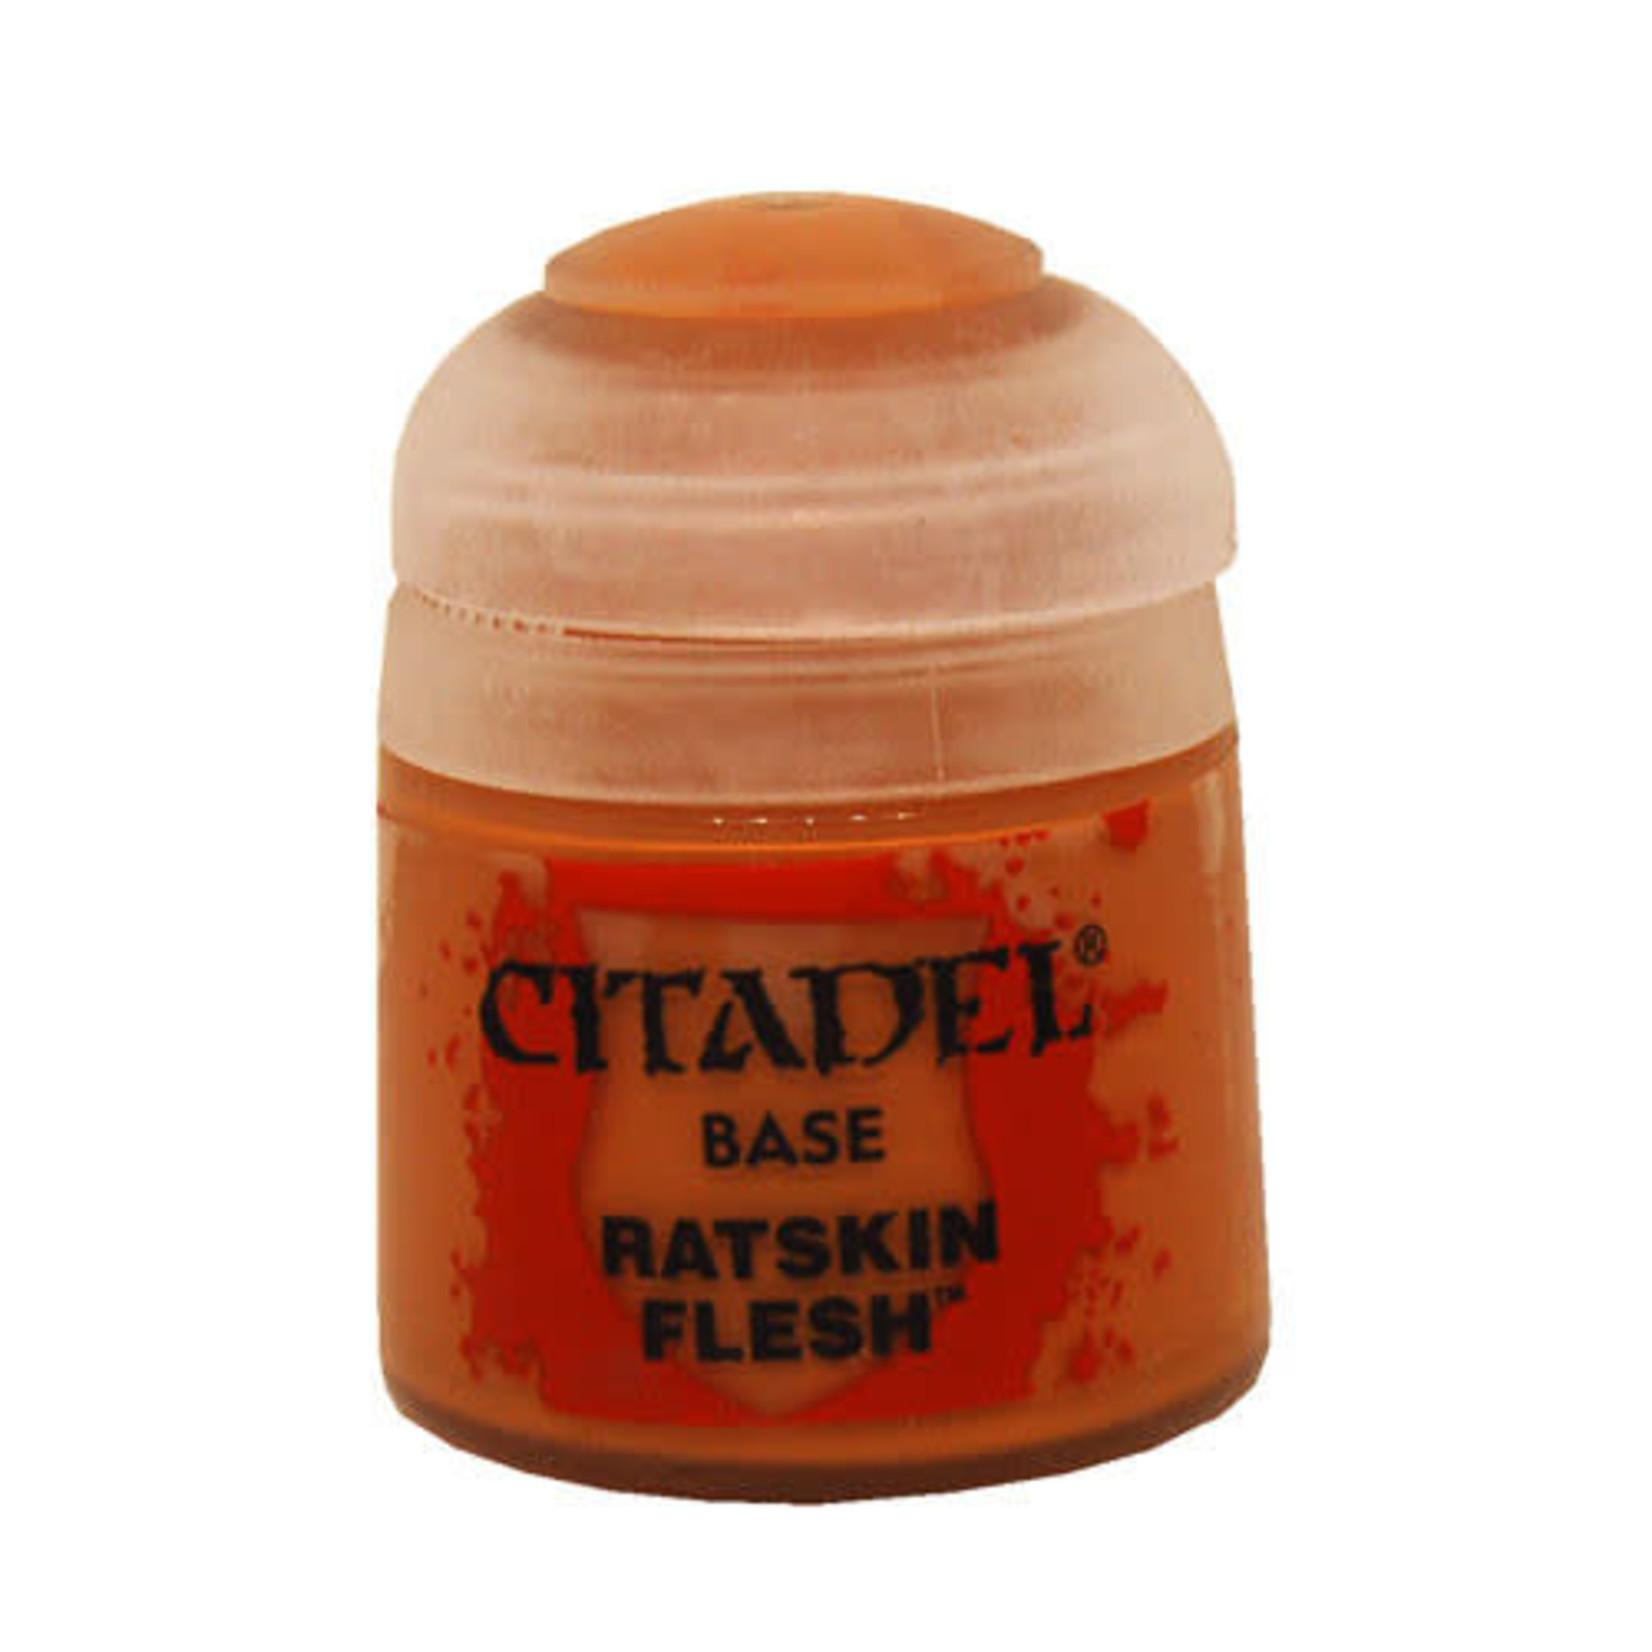 Citadel Citadel Paint - Base: Ratskin Flesh